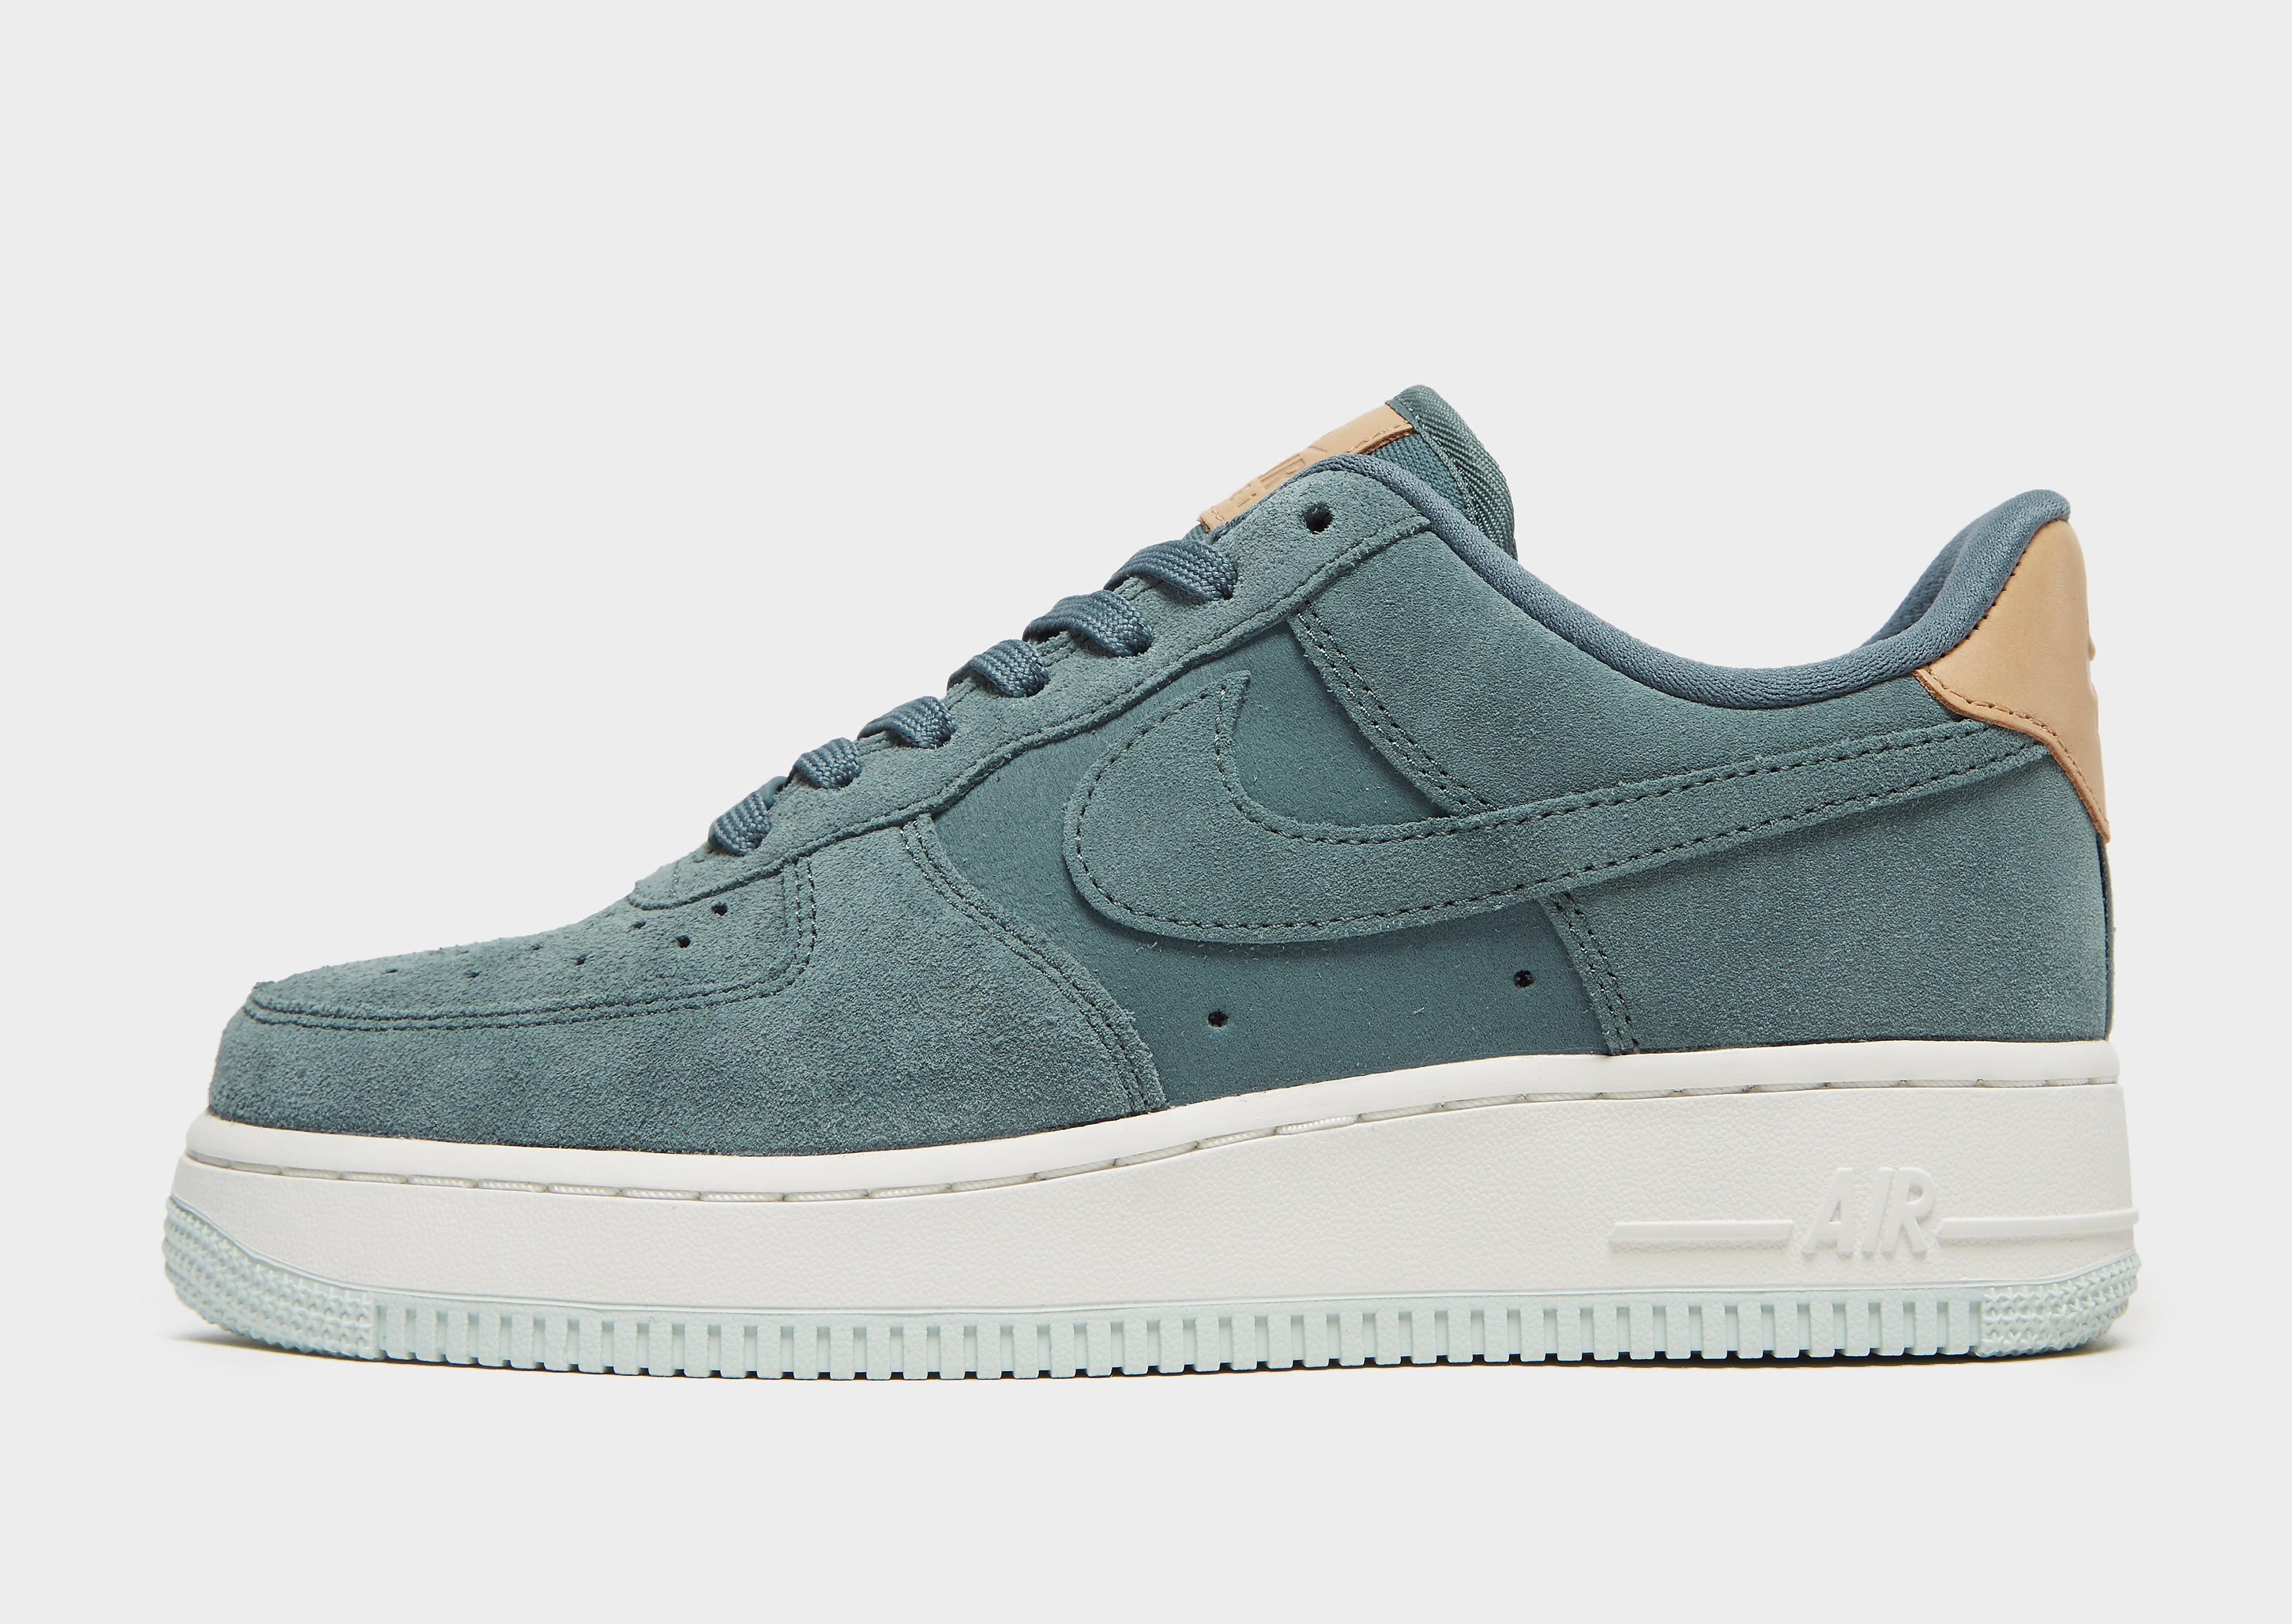 Nike Air Force 1 Premium Dames - Groen - Dames